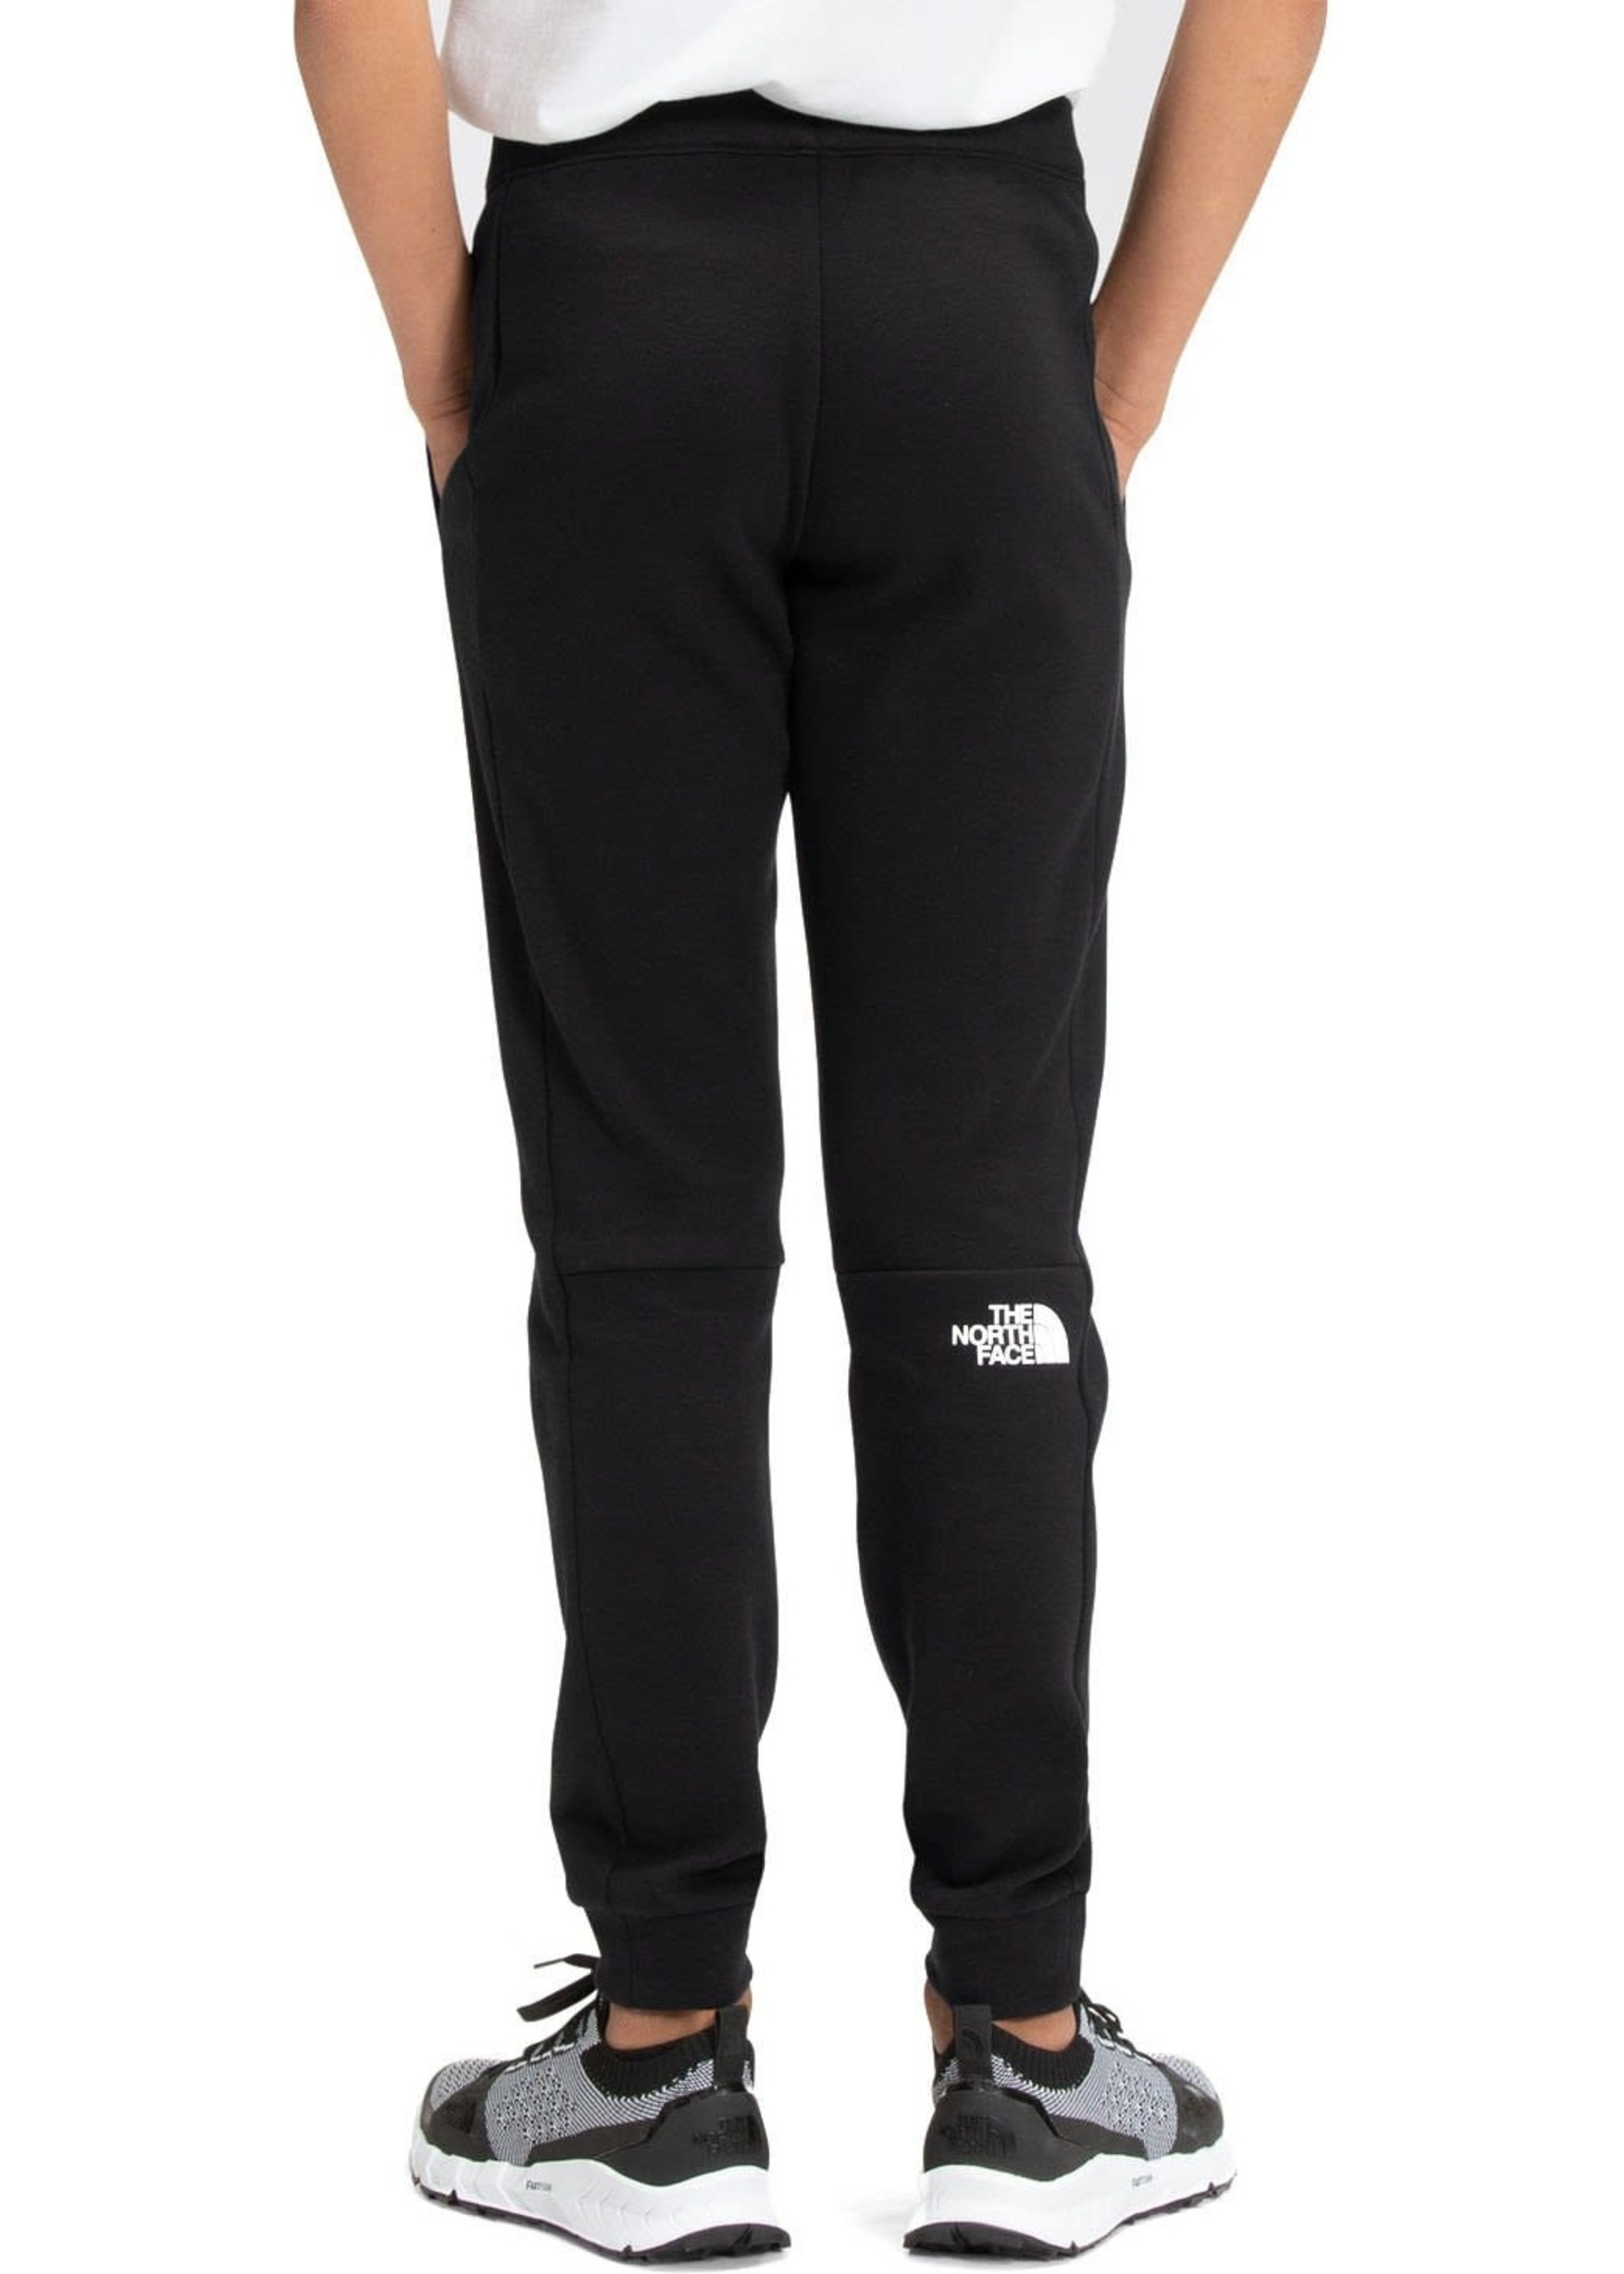 THE NORTH FACE Pantalon Slacker